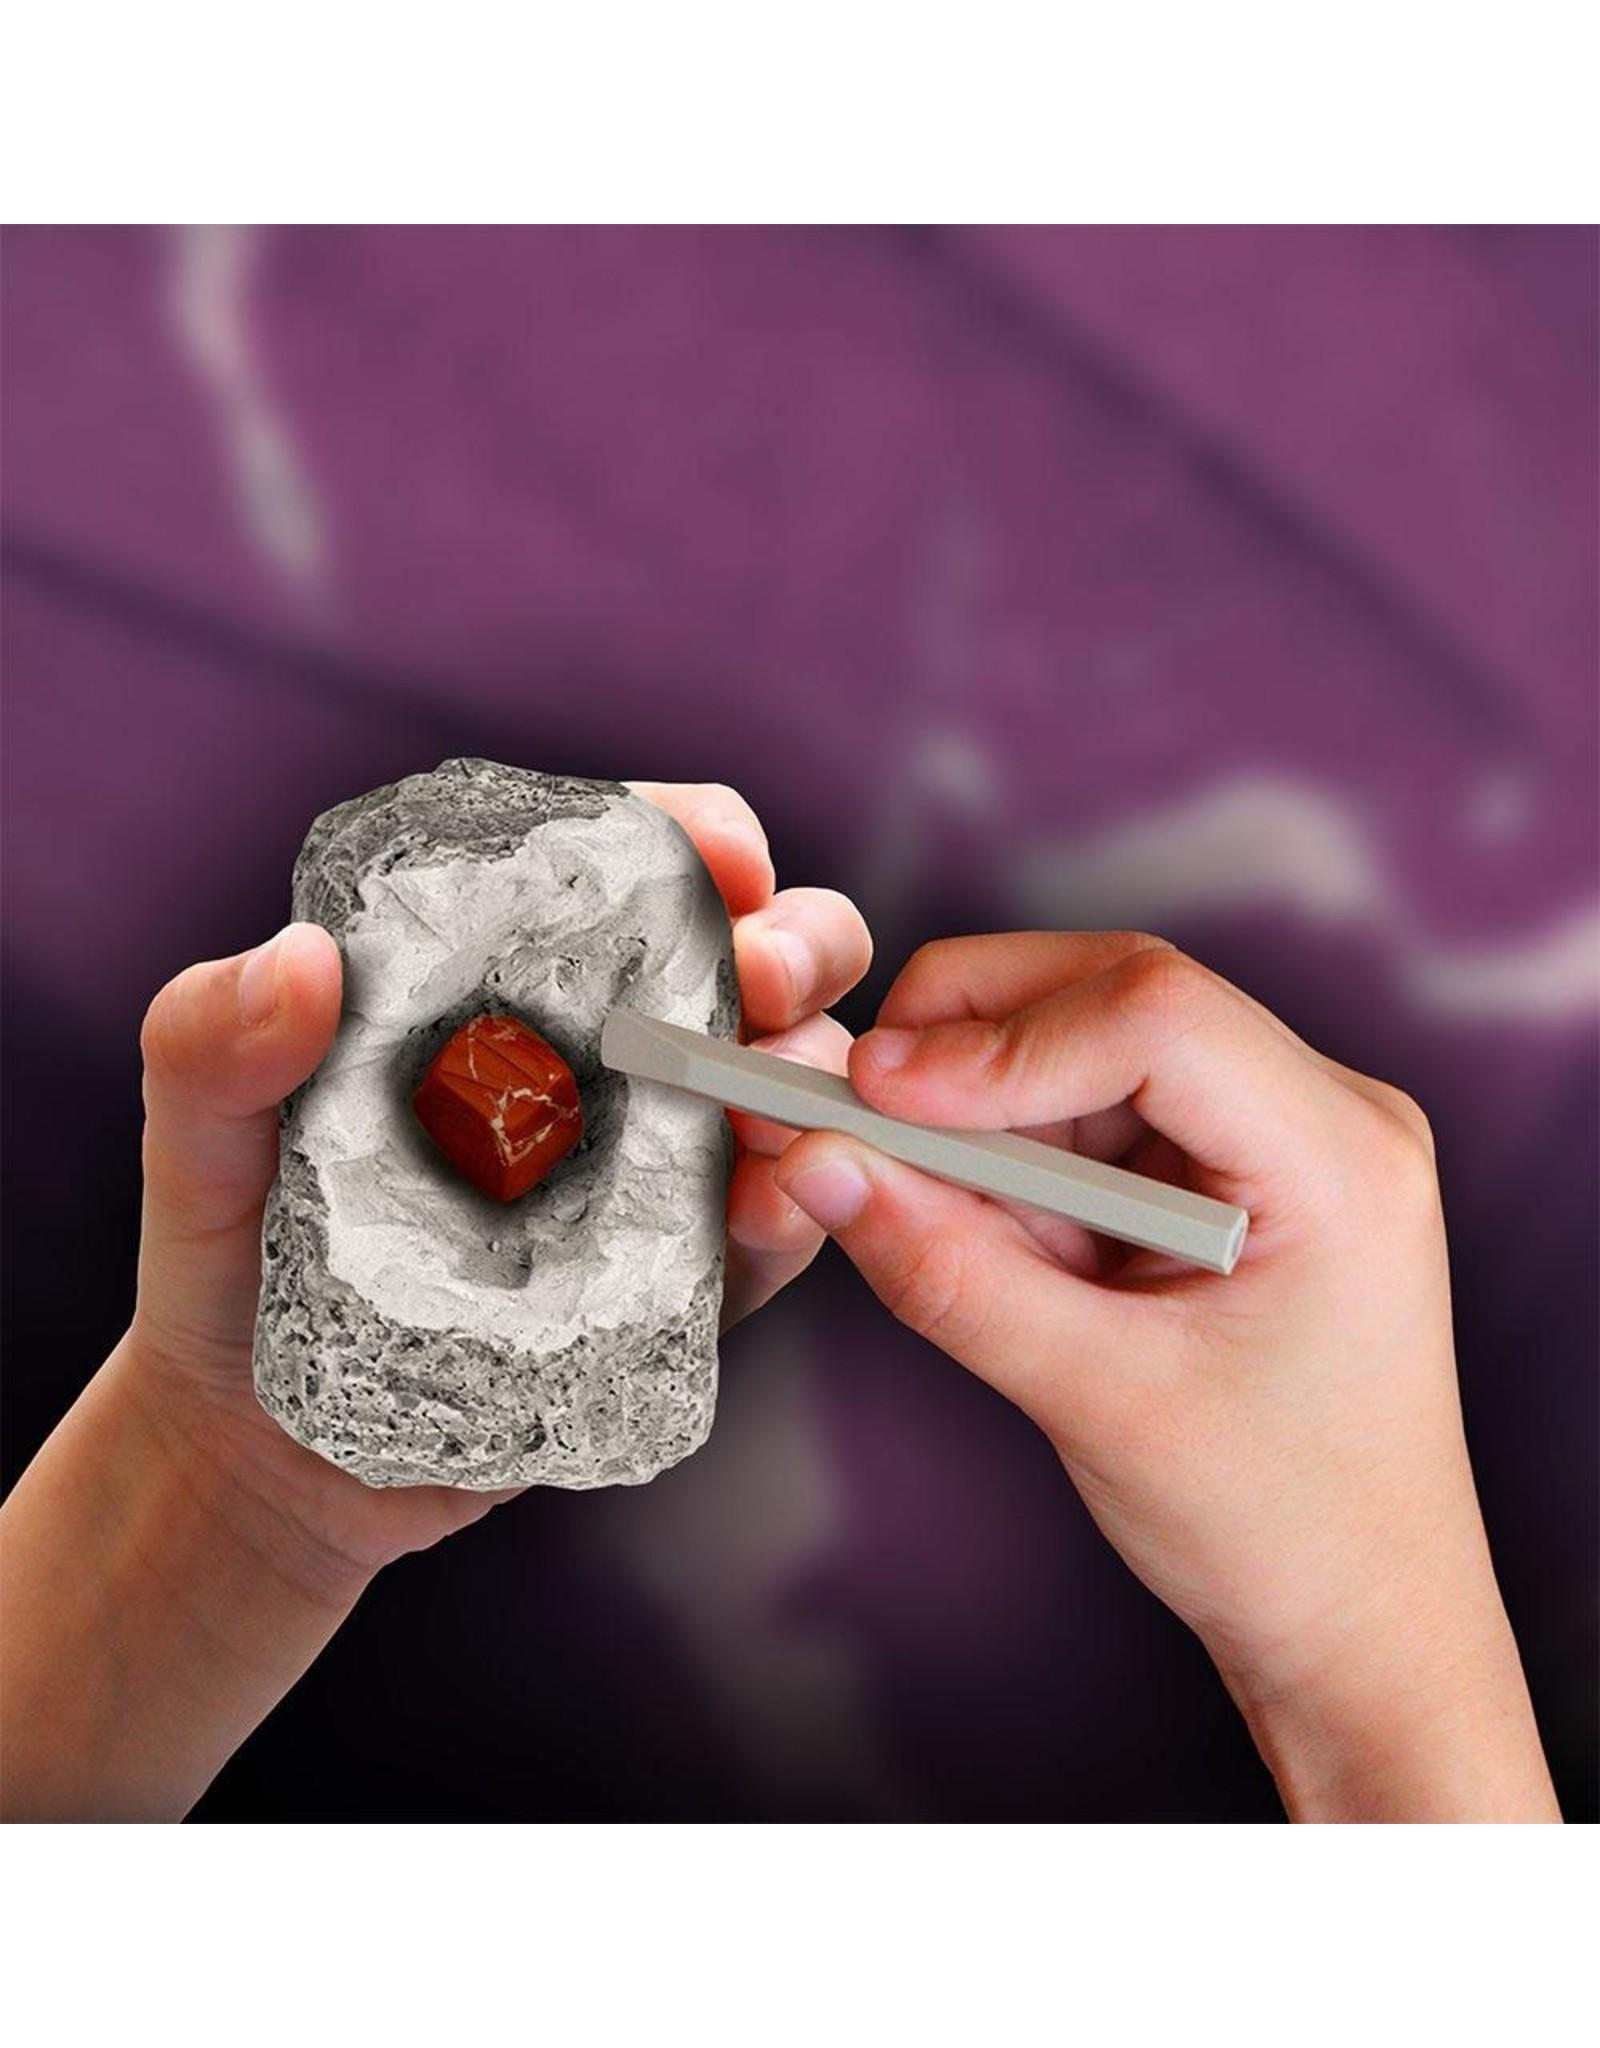 Thames & Kosmos I Dig it! Rocks & Fossils